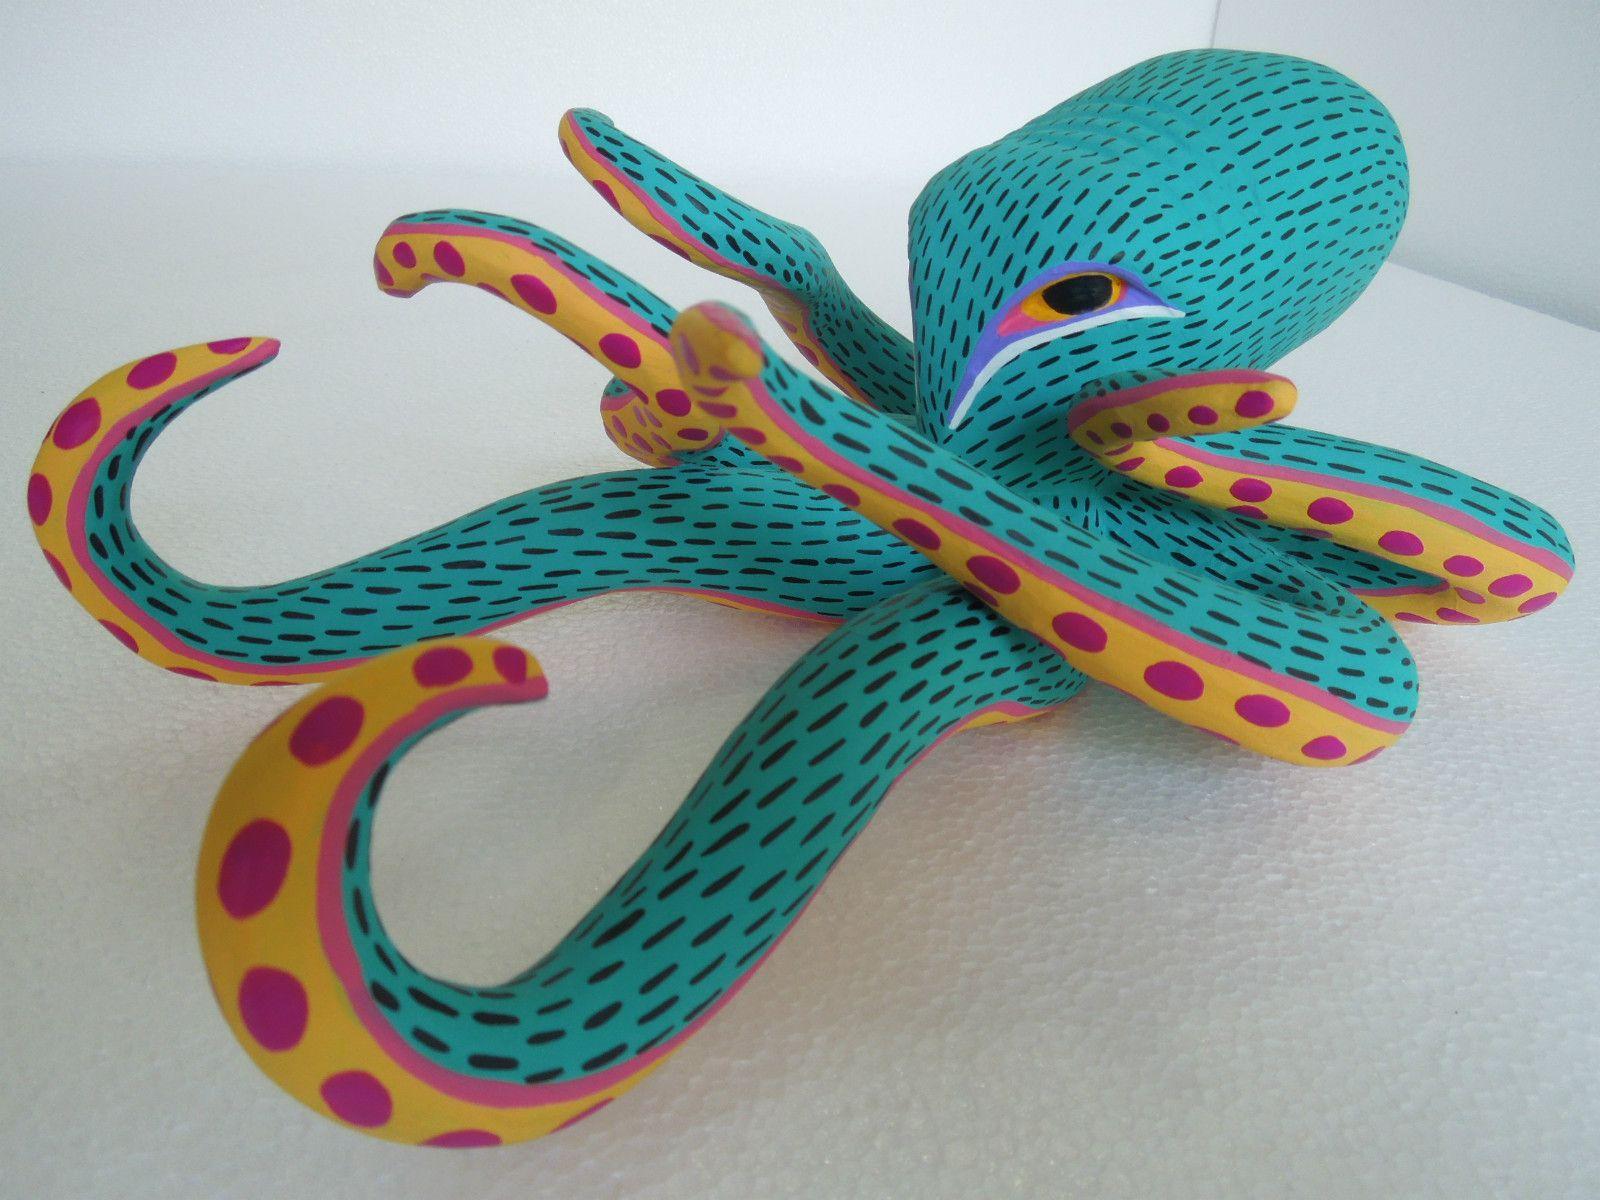 Collection octopus oaxacan wood carving alebrije sculpture